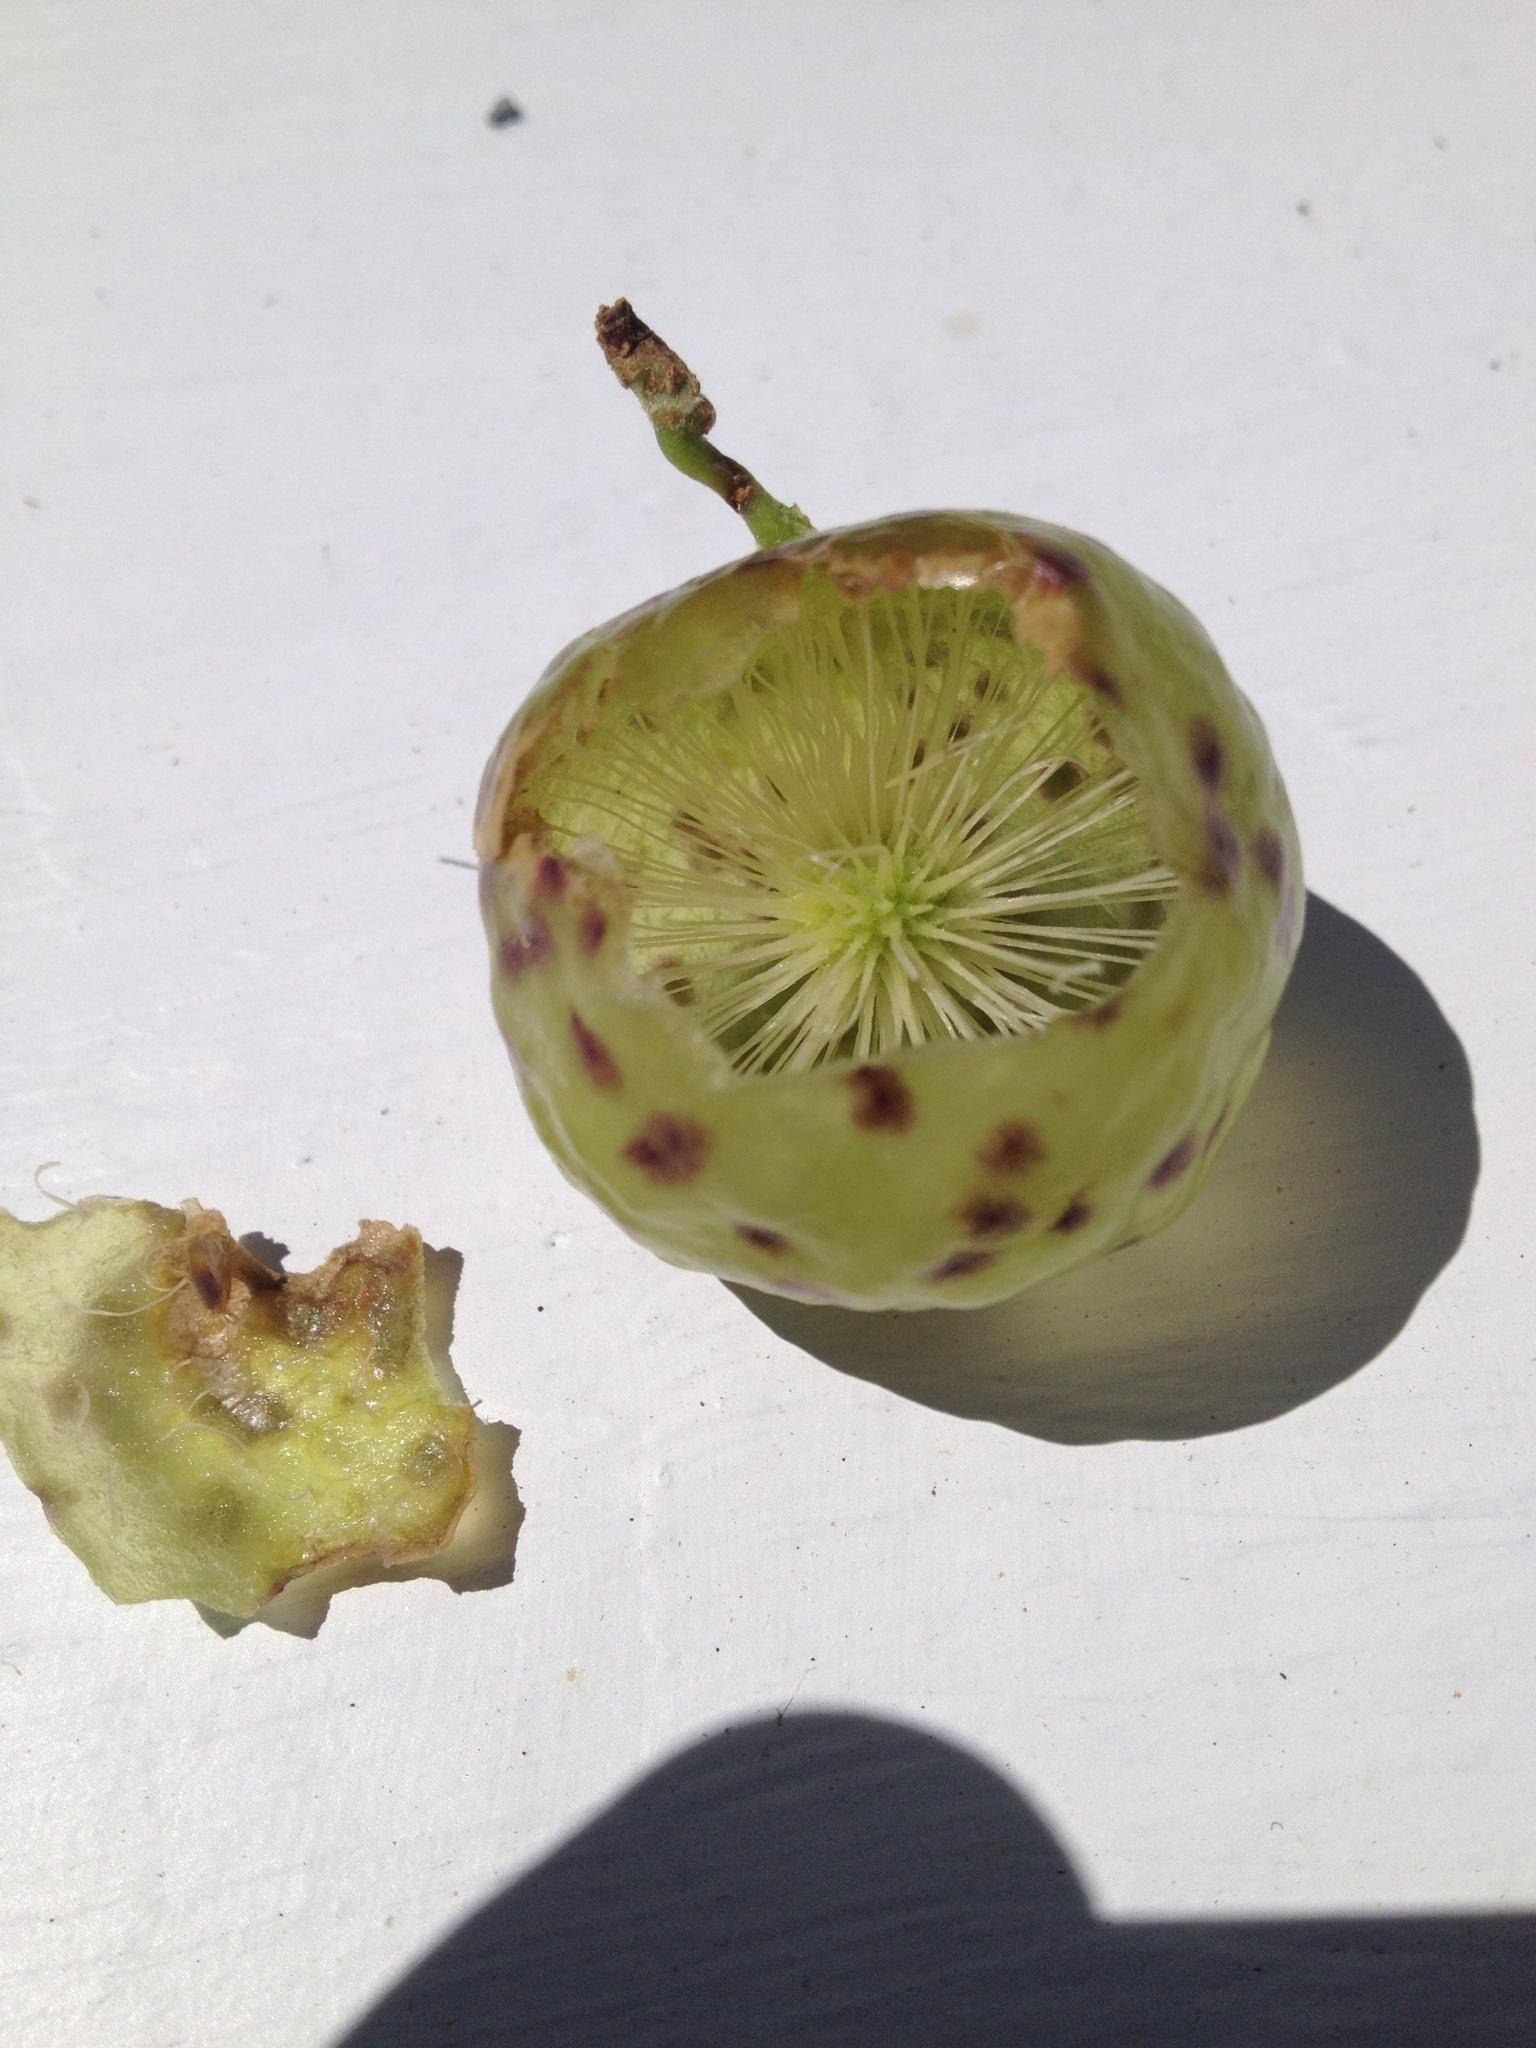 do fruit flies bite green fruit with seeds